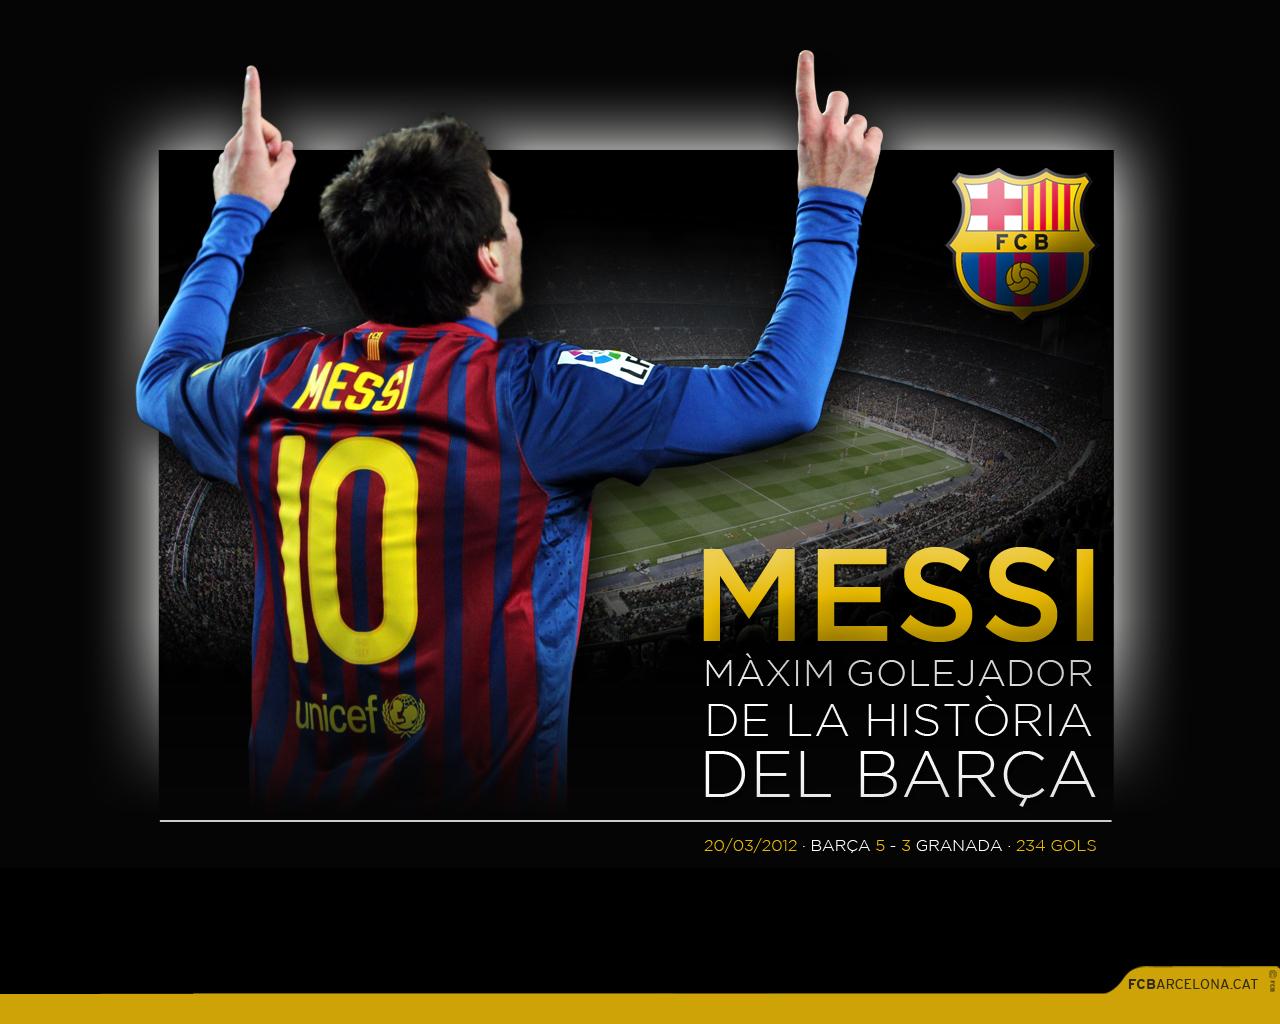 Most Inspiring Wallpaper Logo Messi - FCB_messi_maxim_golejador-cat  Gallery_4792100.jpg